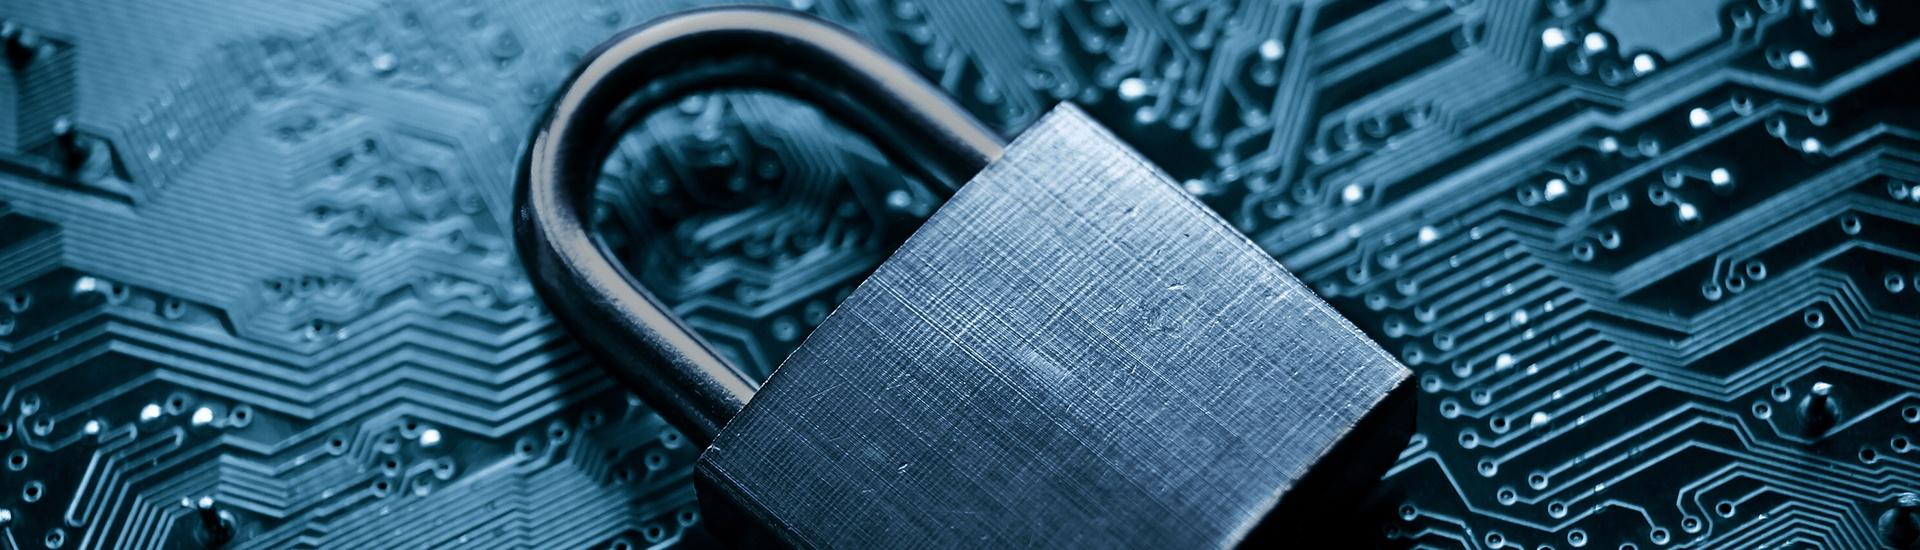 CiscoSpark_SecurityCollaboration